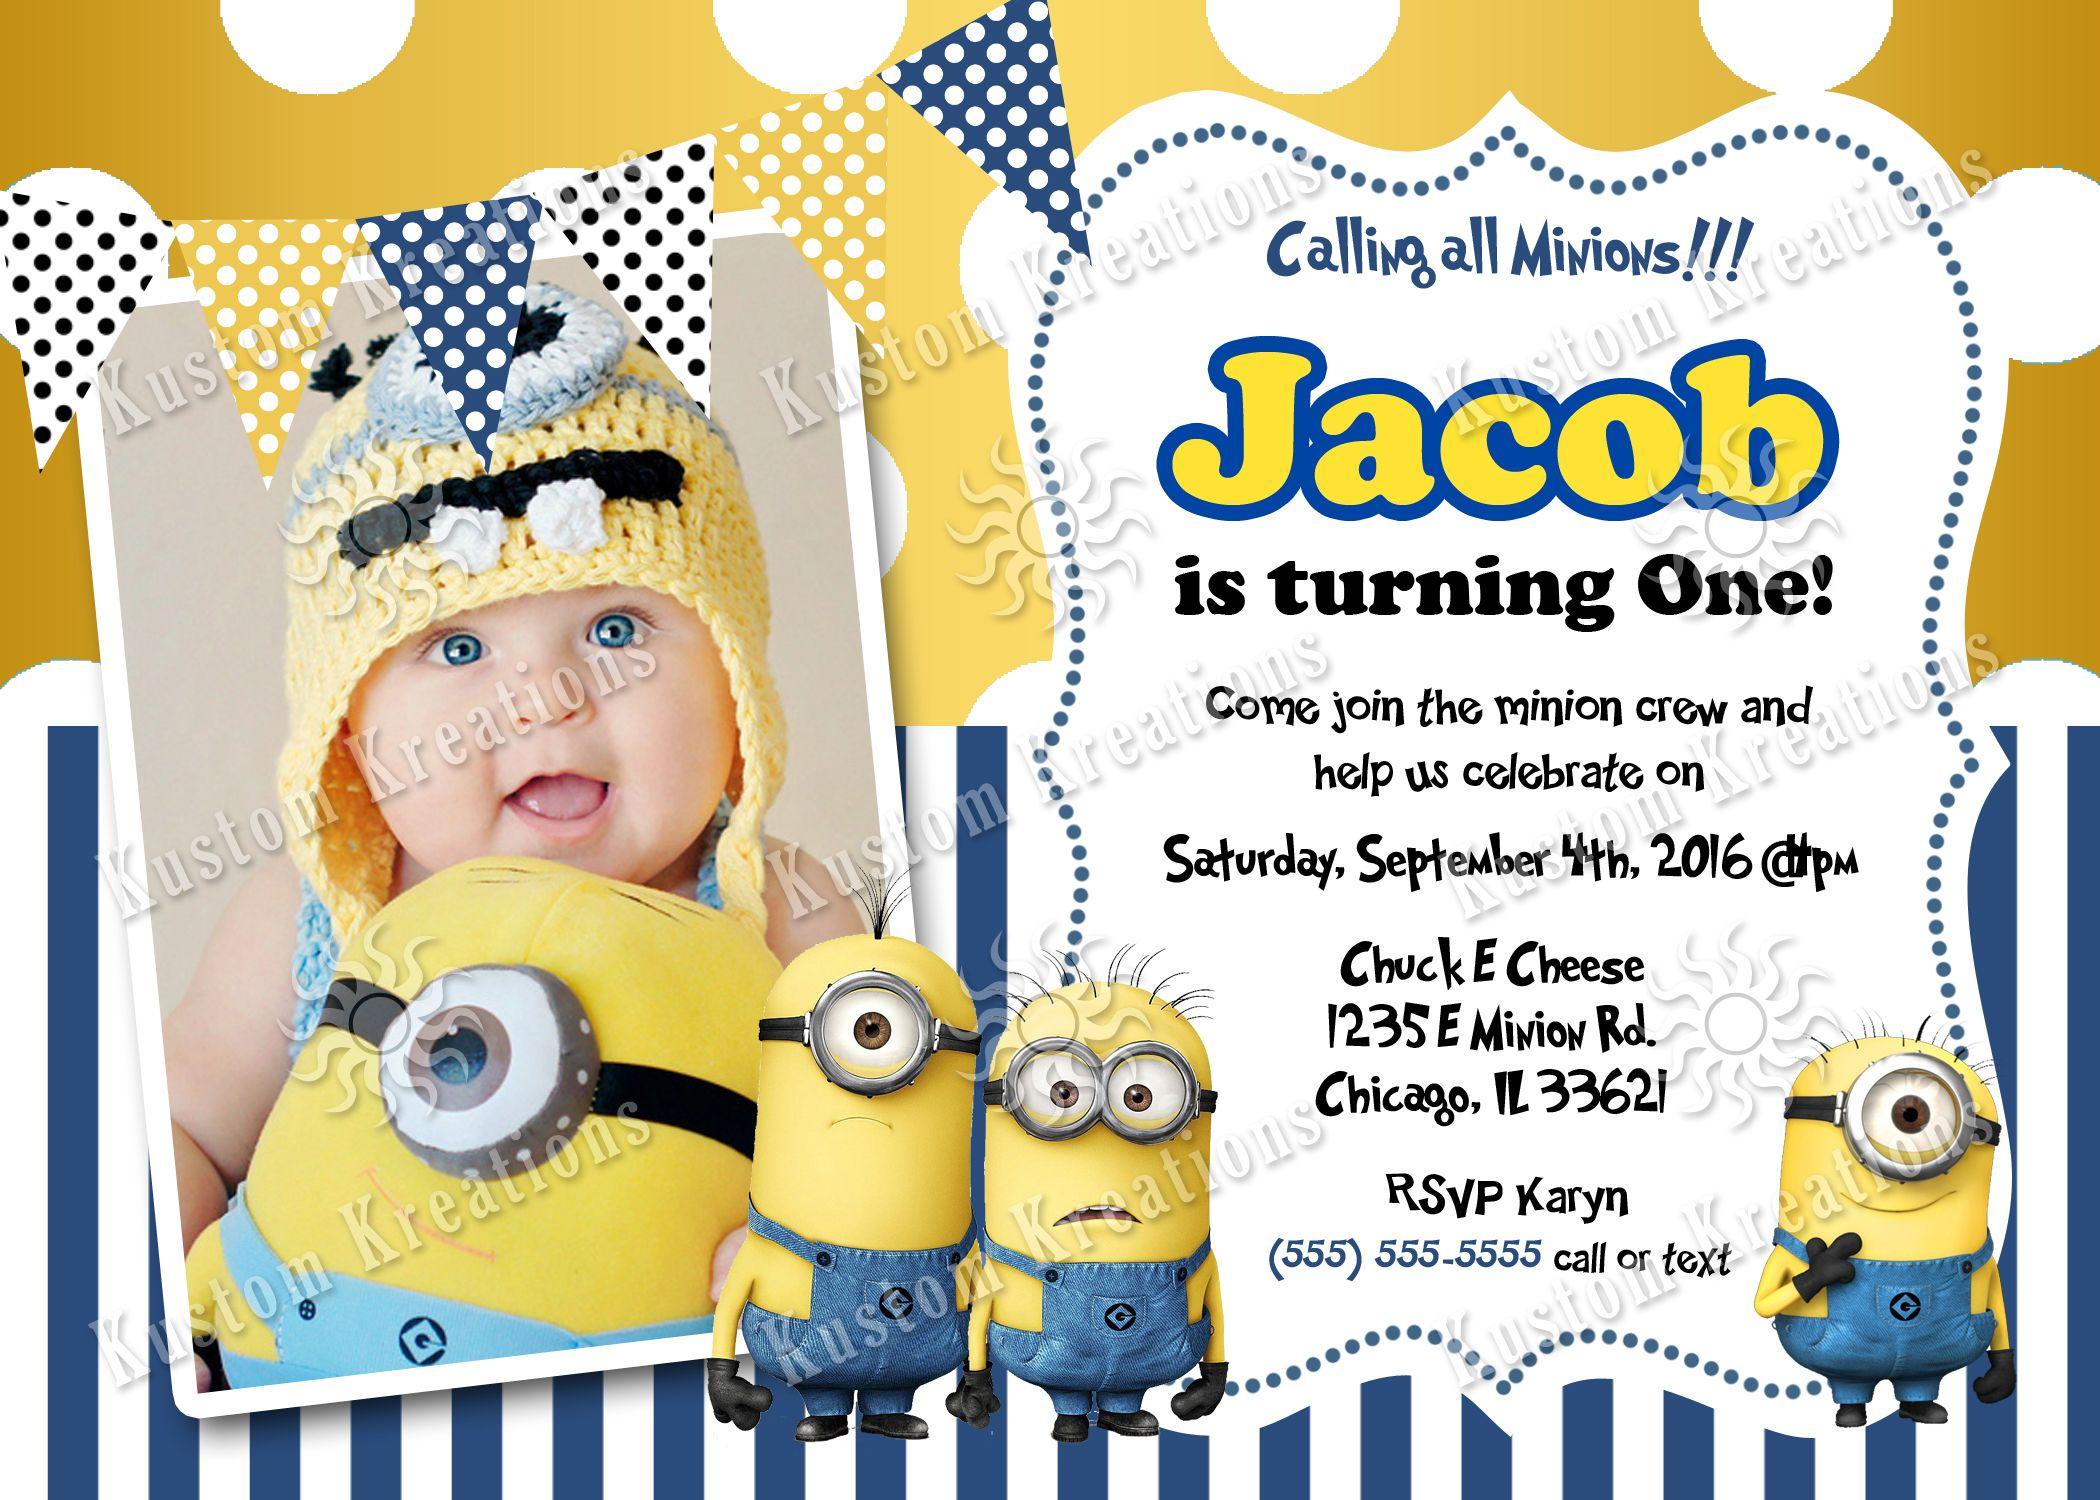 Minions Birthday Invitations Minion Birthday Invitations Birthday Invitation Card Template Boy Birthday Invitations